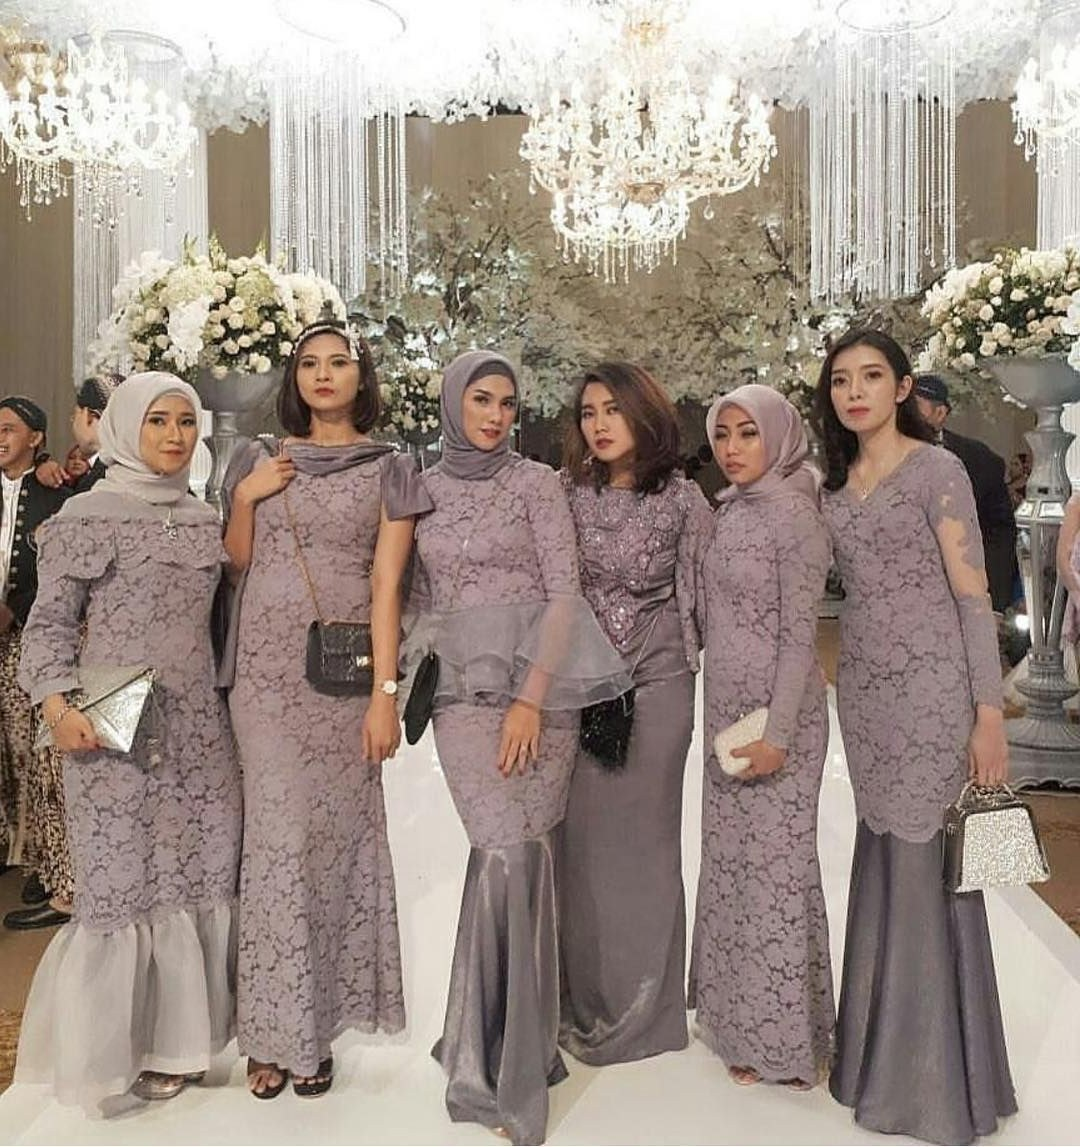 Ide Inspirasi Gaun Bridesmaid Hijab Bqdd Instagram Post by Inspirasi Kebaya Dan Gaun • Jul 19 2018 at